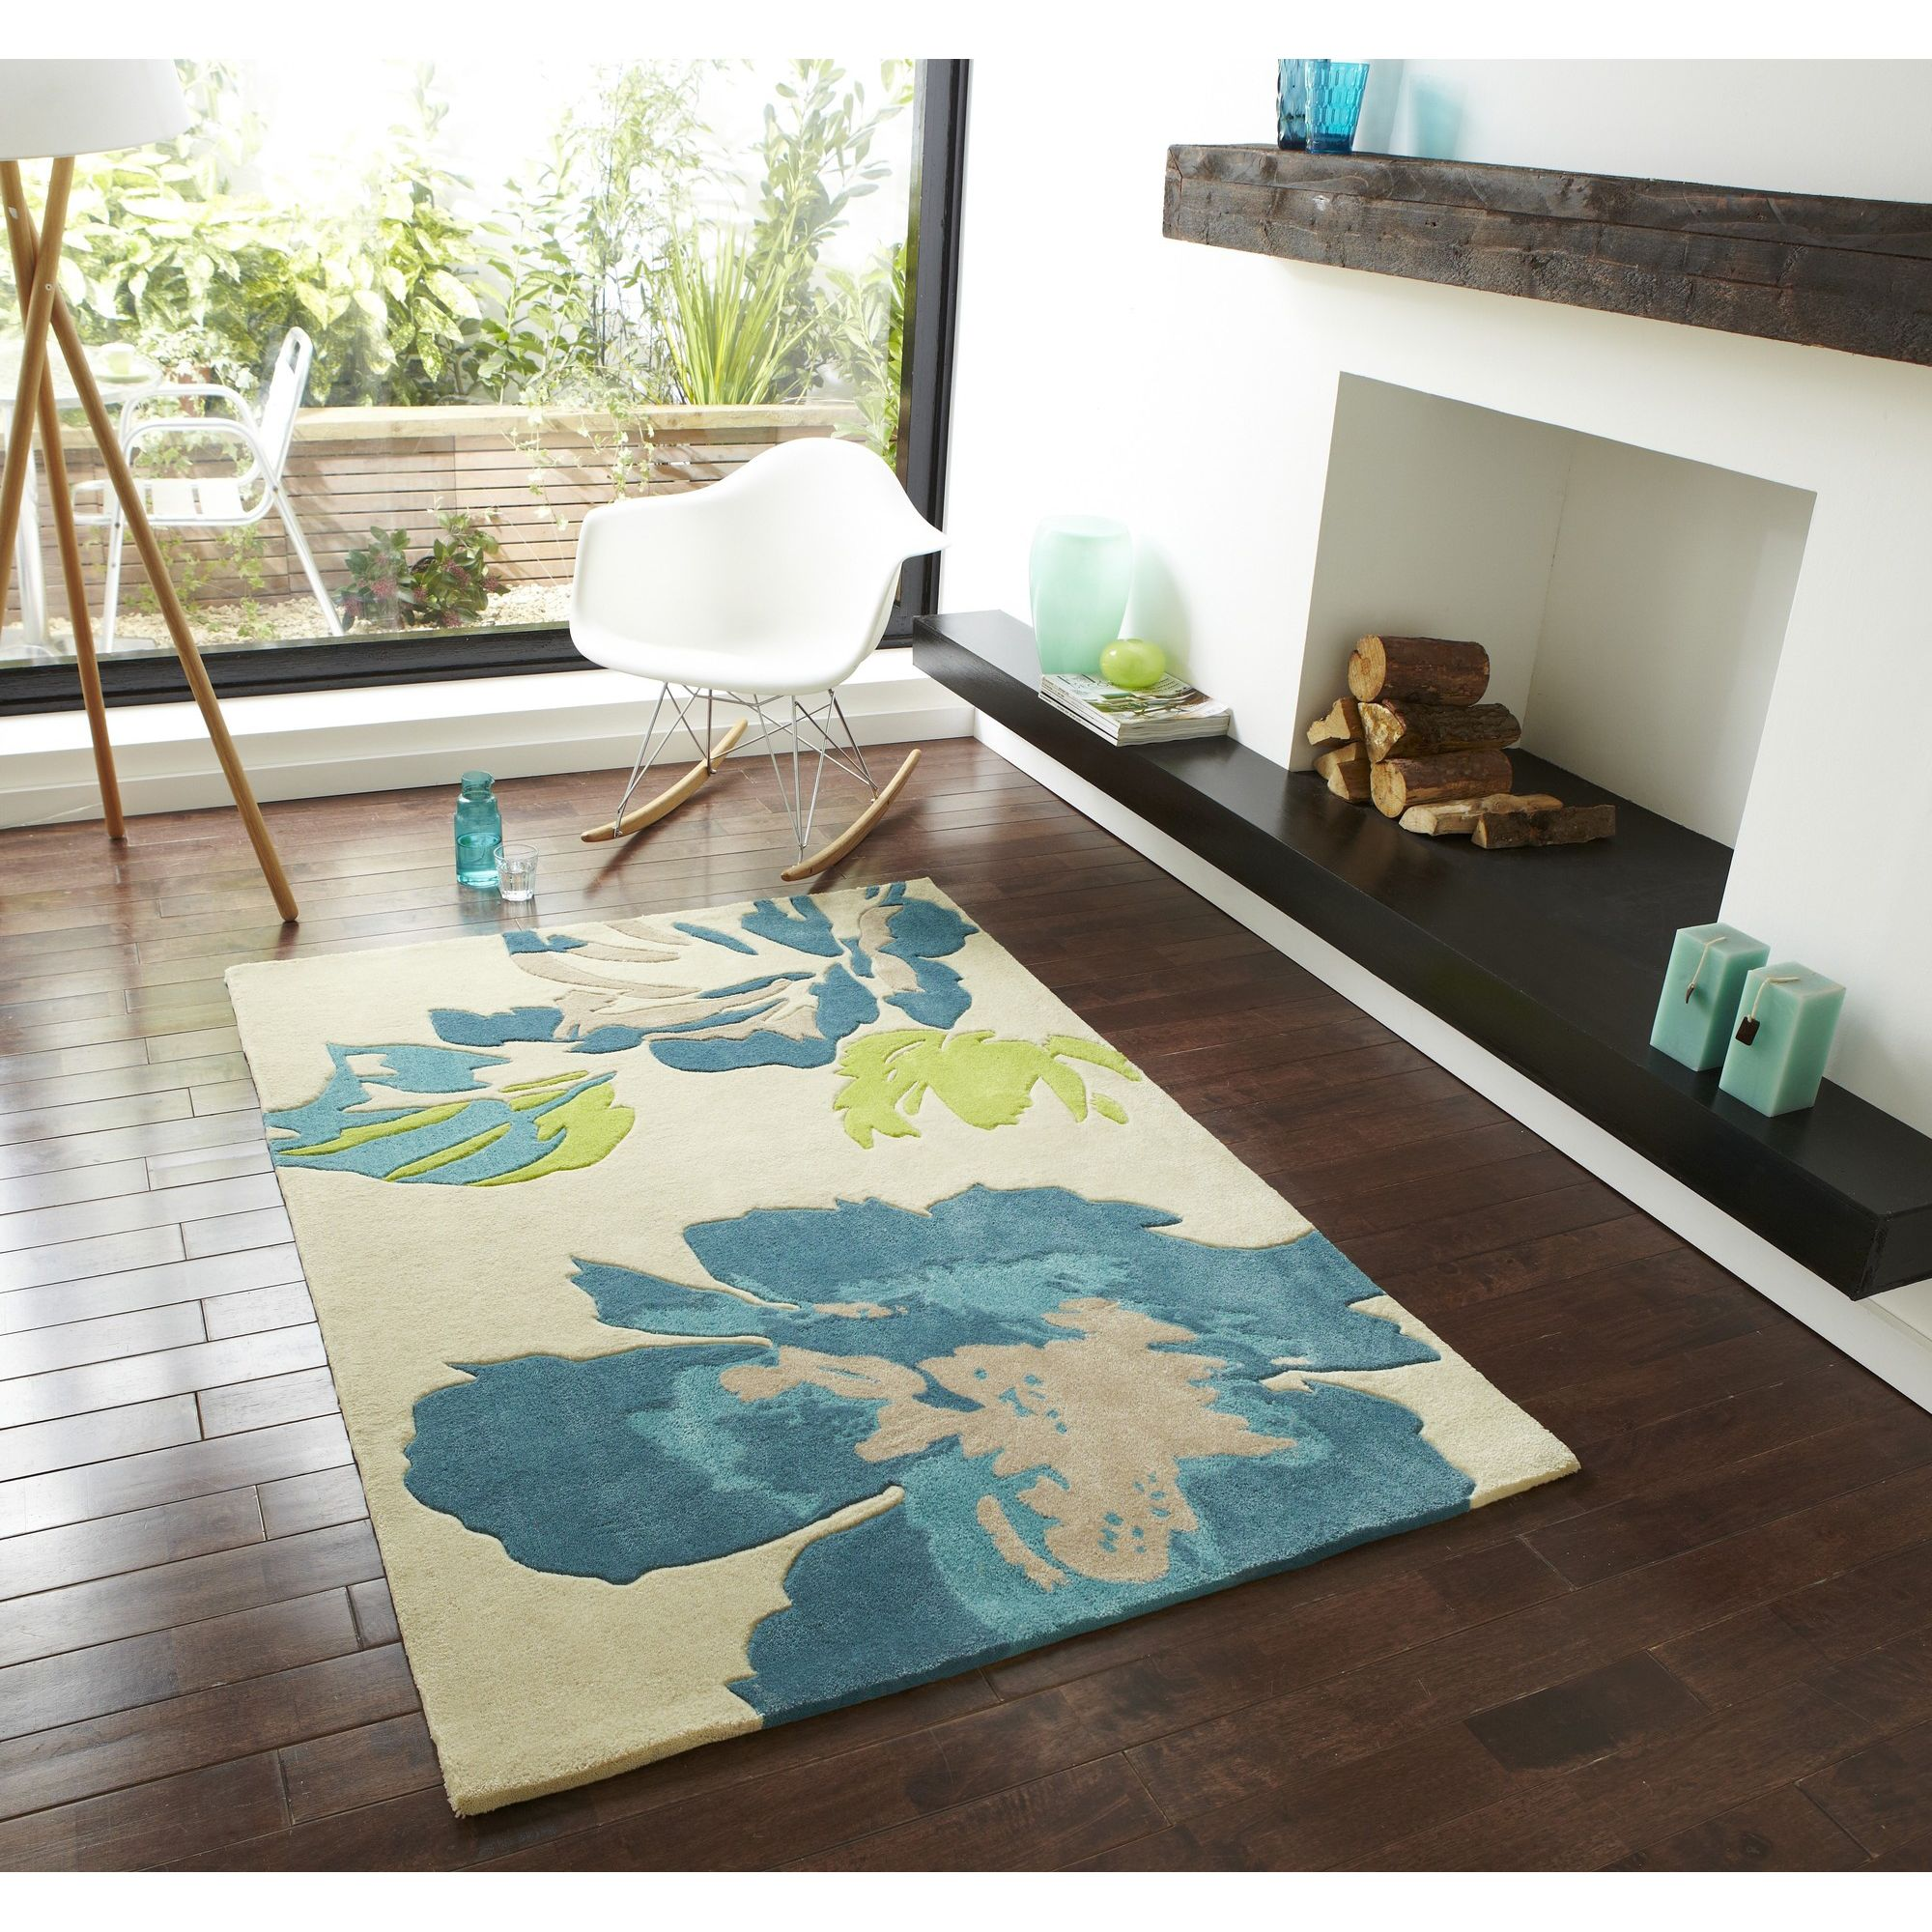 Oriental Carpets & Rugs Hong Kong 2827 Beige/Blue Rug - 120cm x 170cm